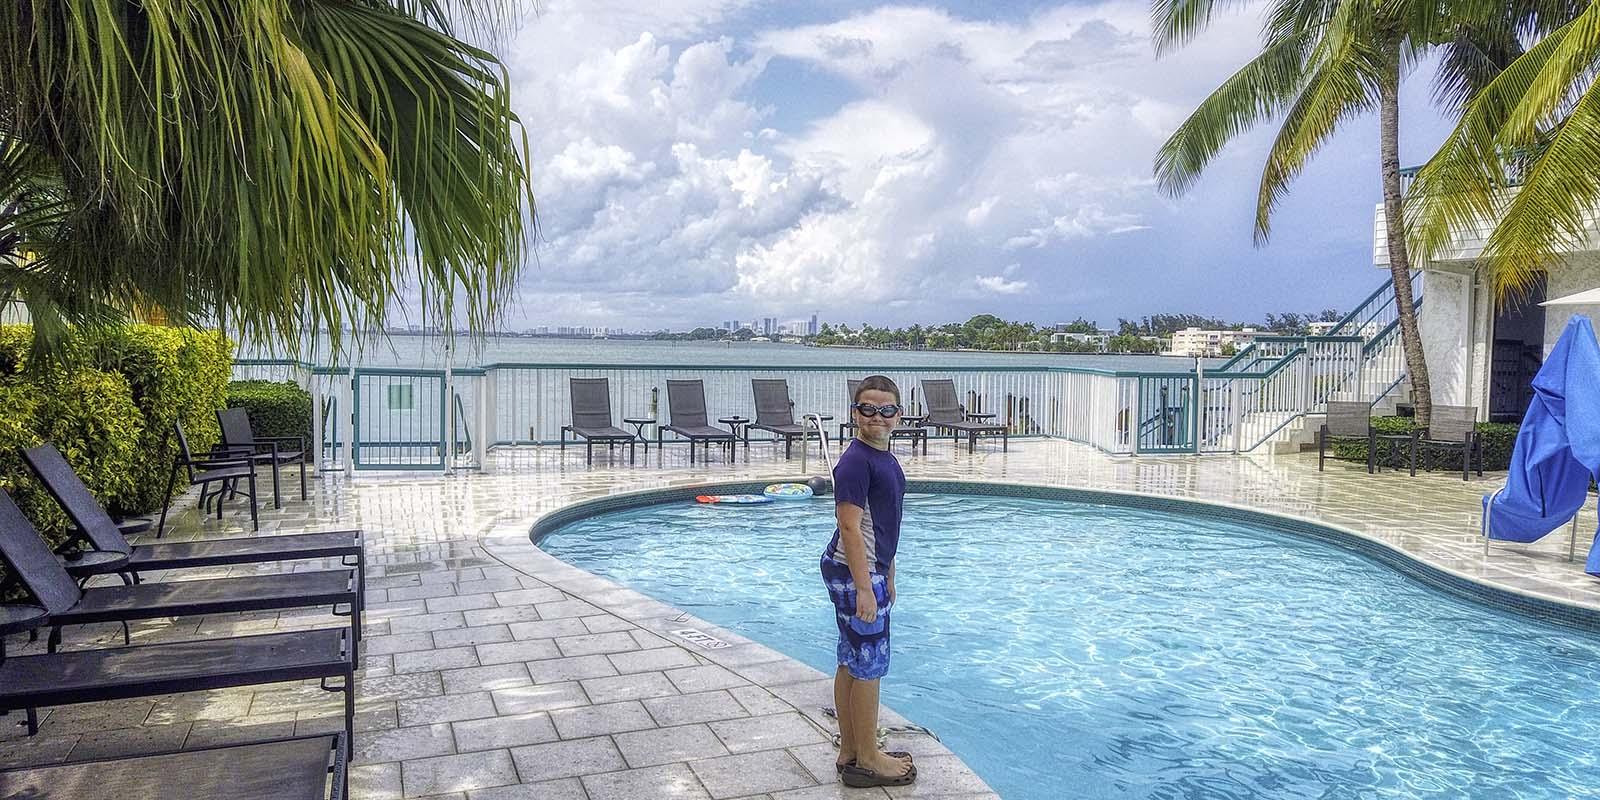 Carless & Homeless in Miami, FL